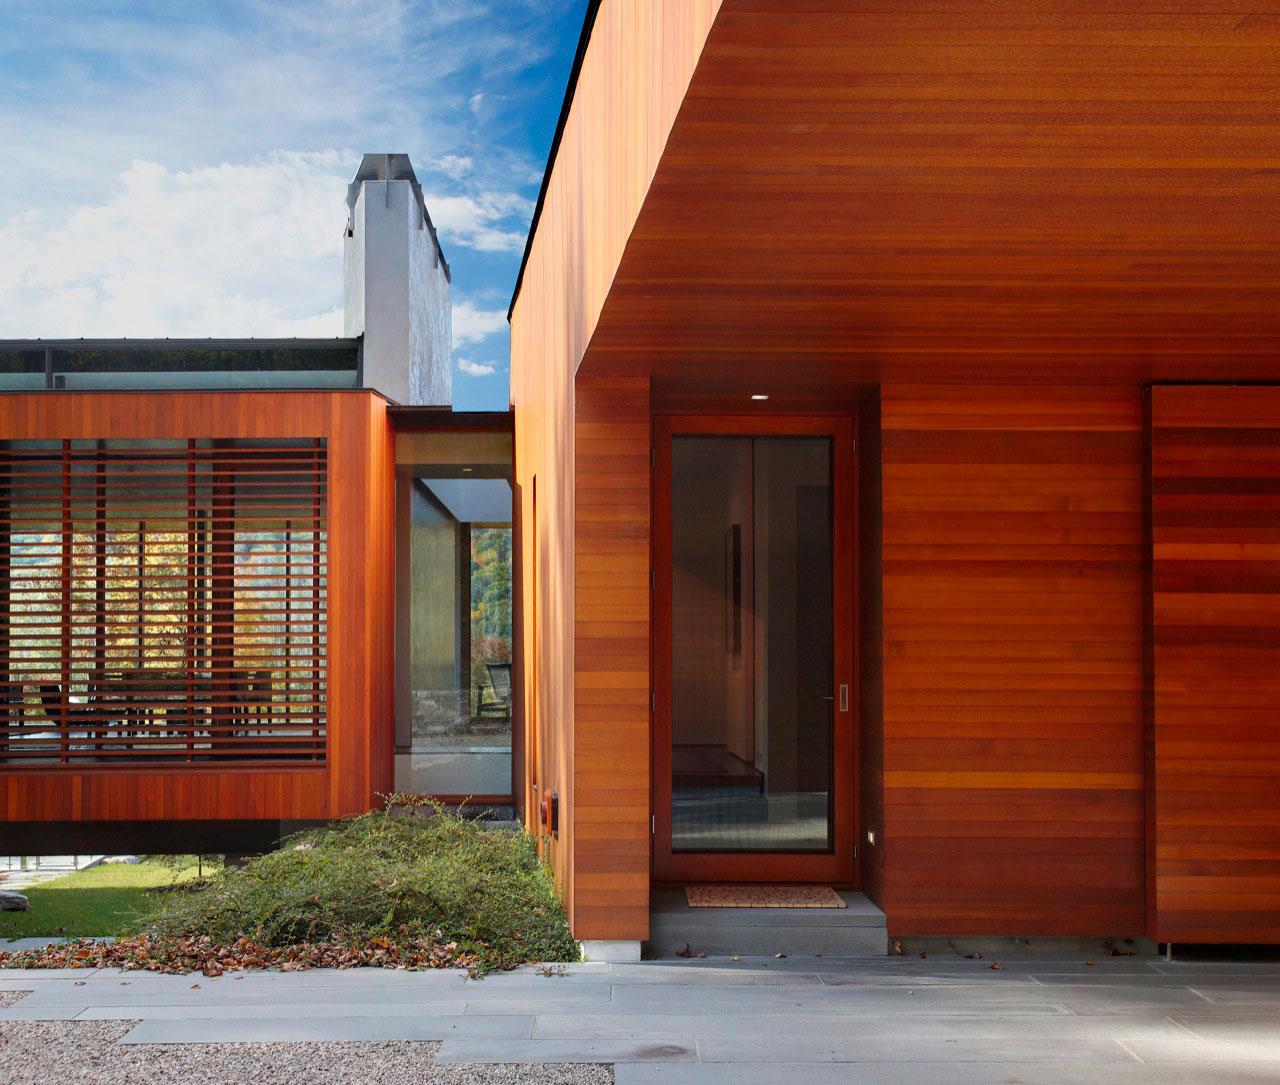 Bridge House By Junsekino Architect And Design: Bridge House By Joeb Moore + Partners Architects